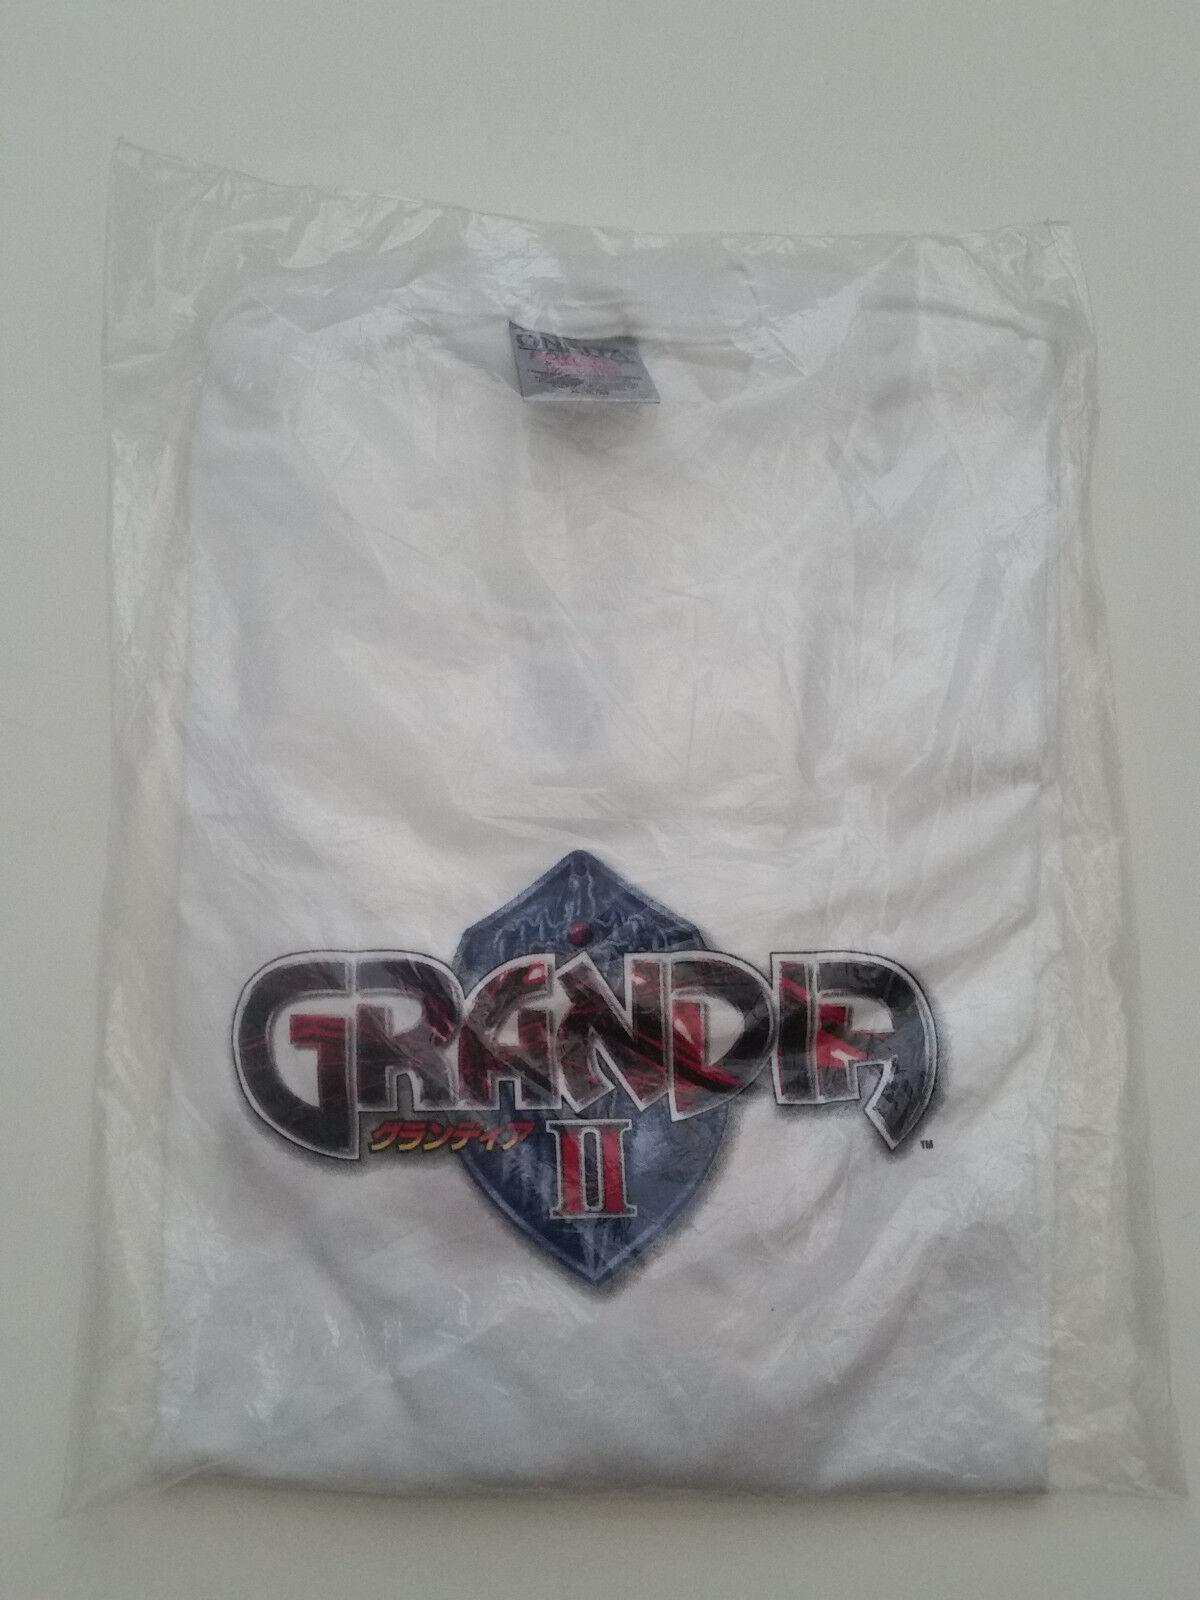 Grandia 2 II Sega Dreamcast rare collectable vintage videogame anime t-shirt XL